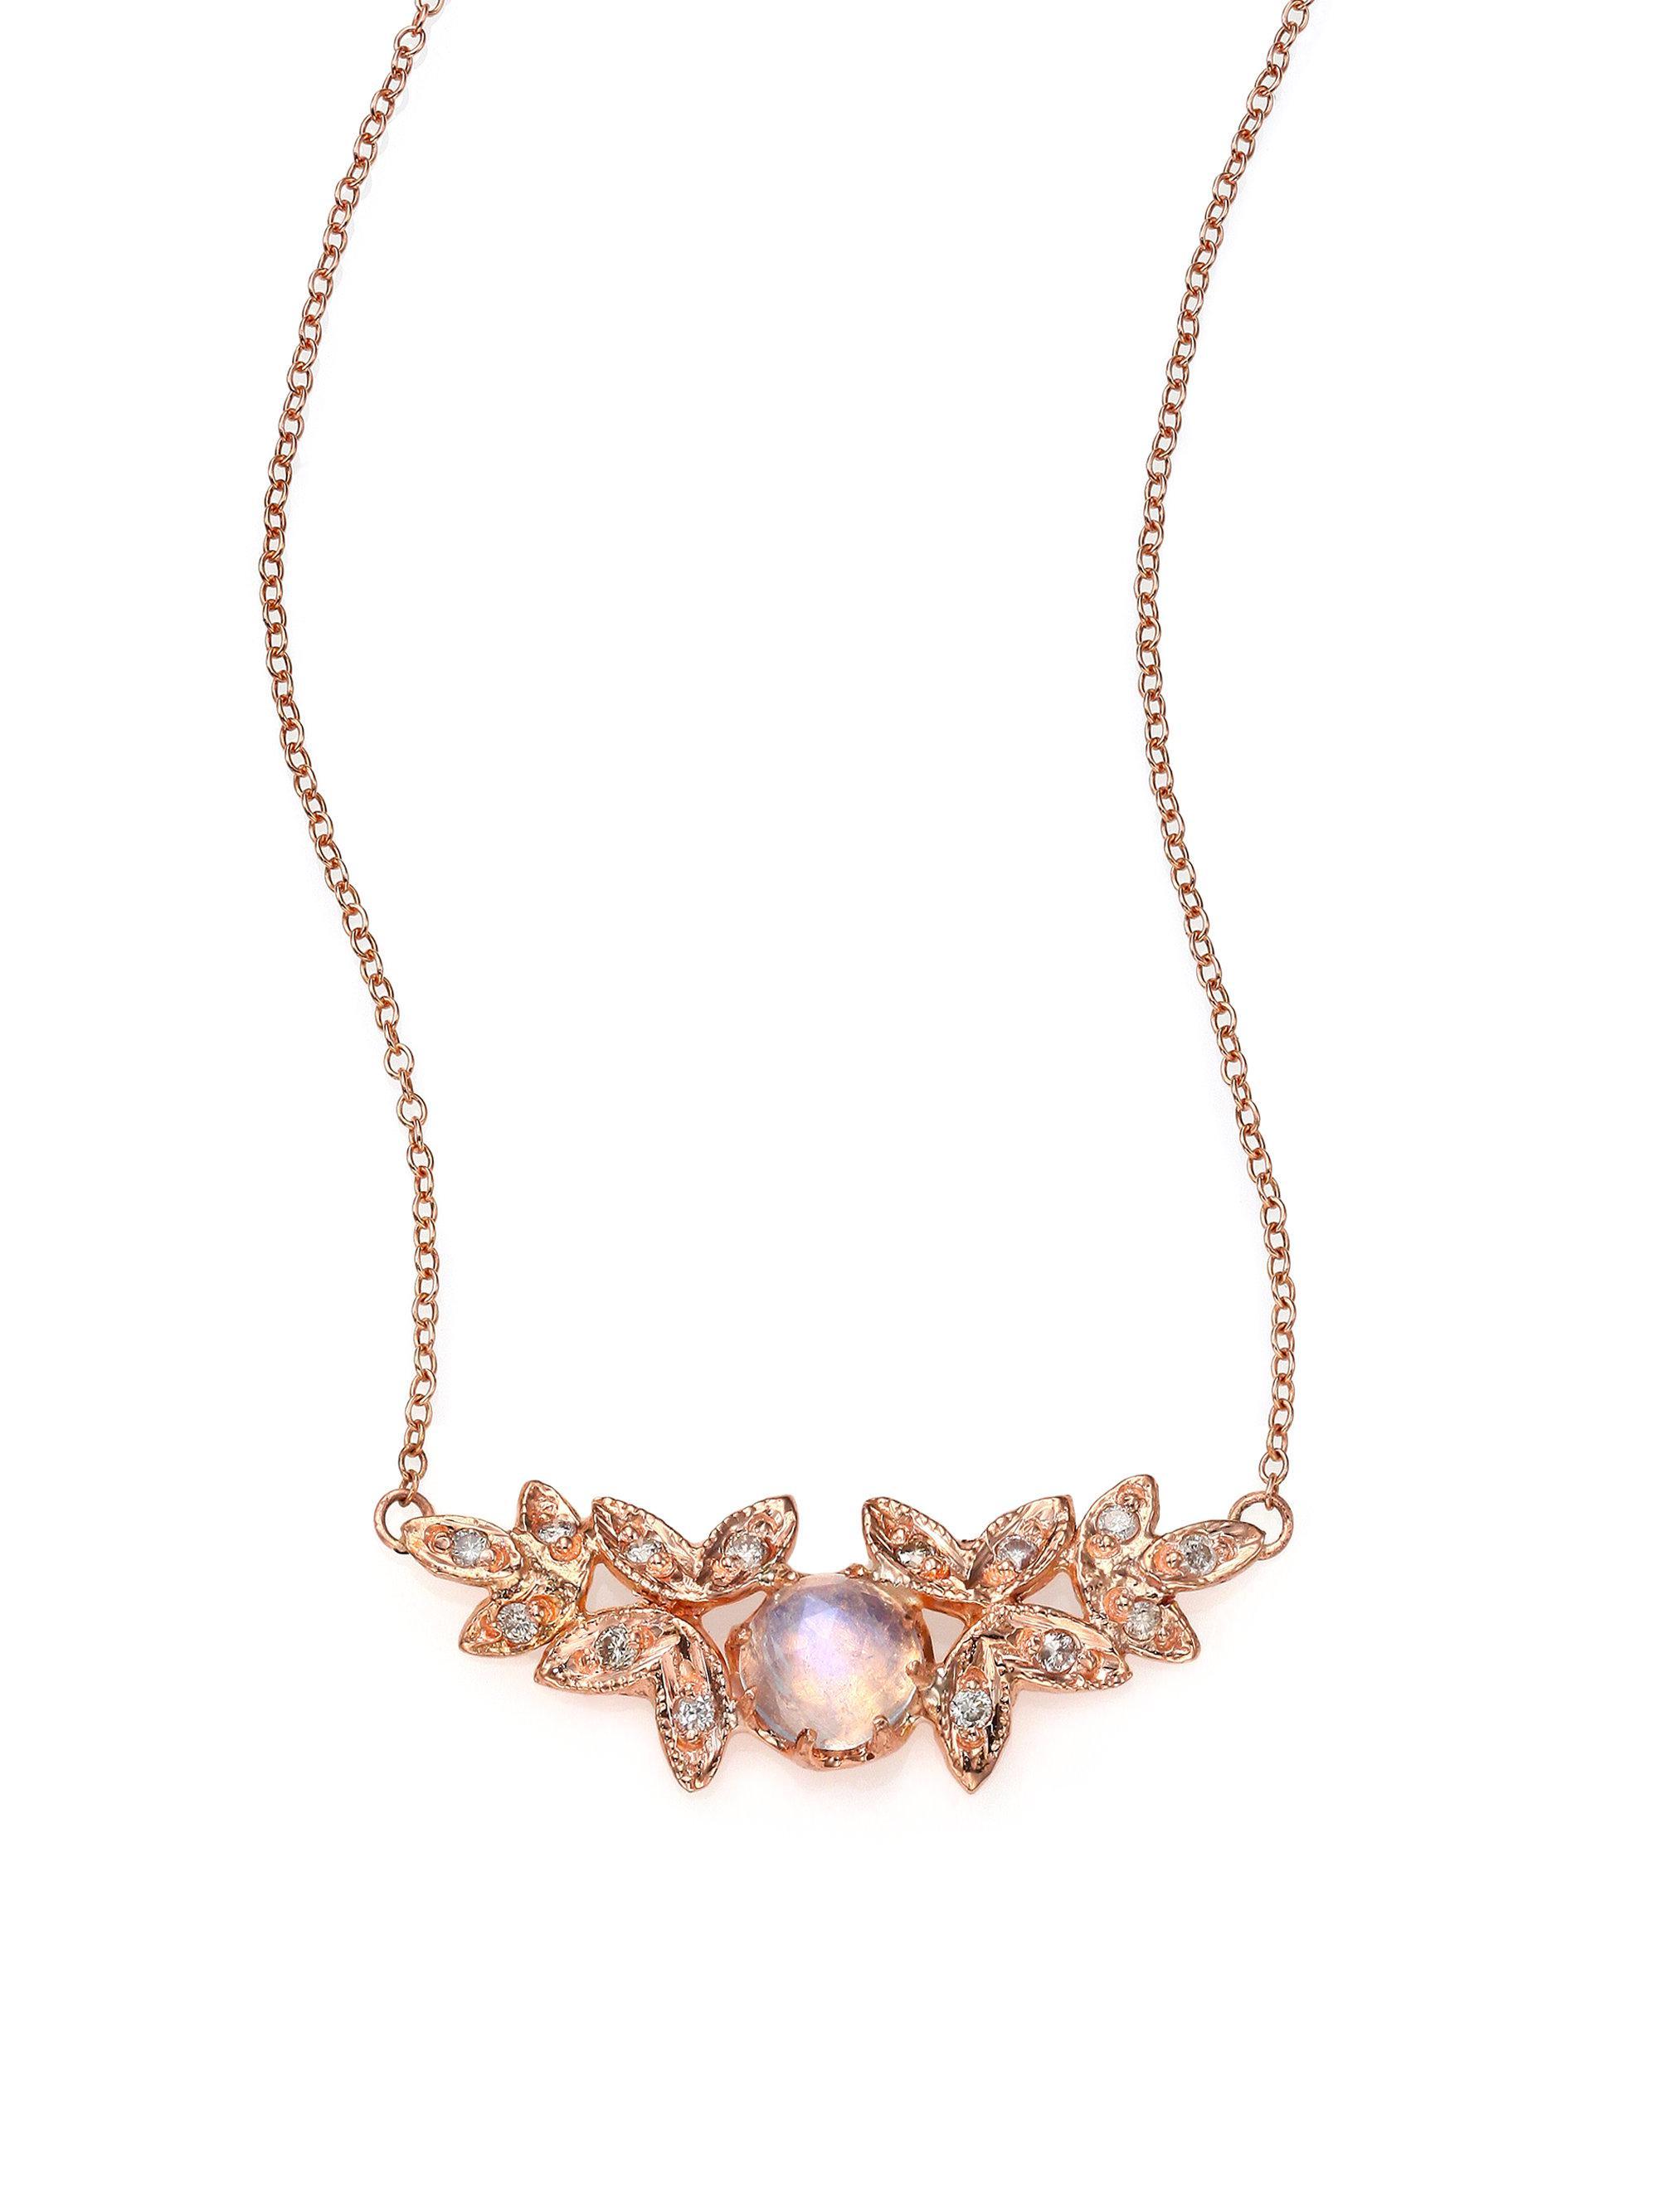 Jacquie Aiche Pavé Diamond Teardrop Necklace in 14K Rose Gold J1zlWeJLVR